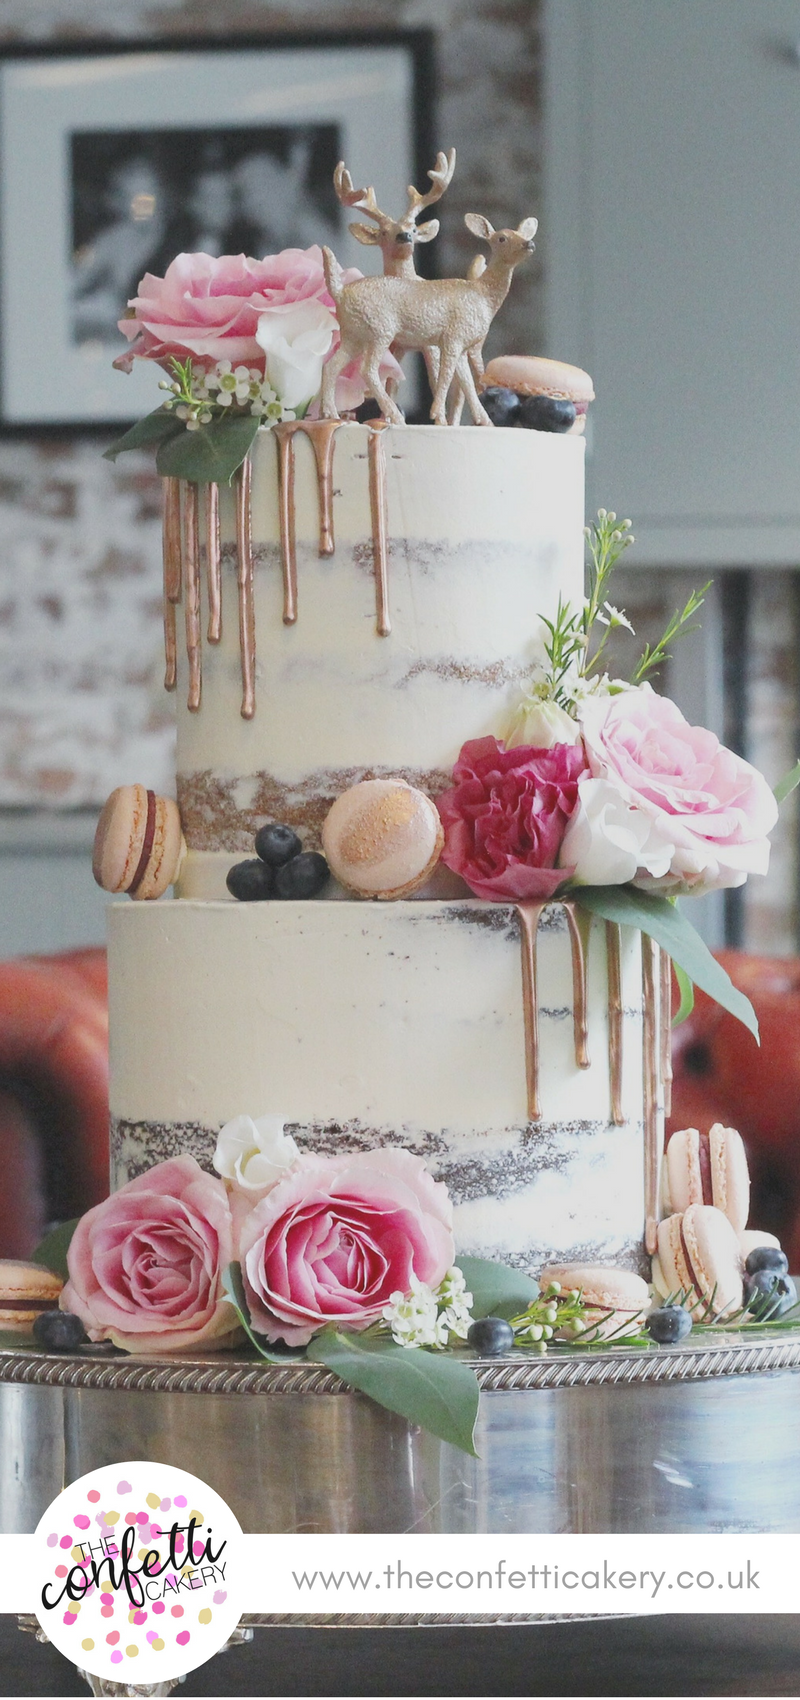 Modern wedding decor images  Modern seminaked wedding cake with macarons rose gold drips and